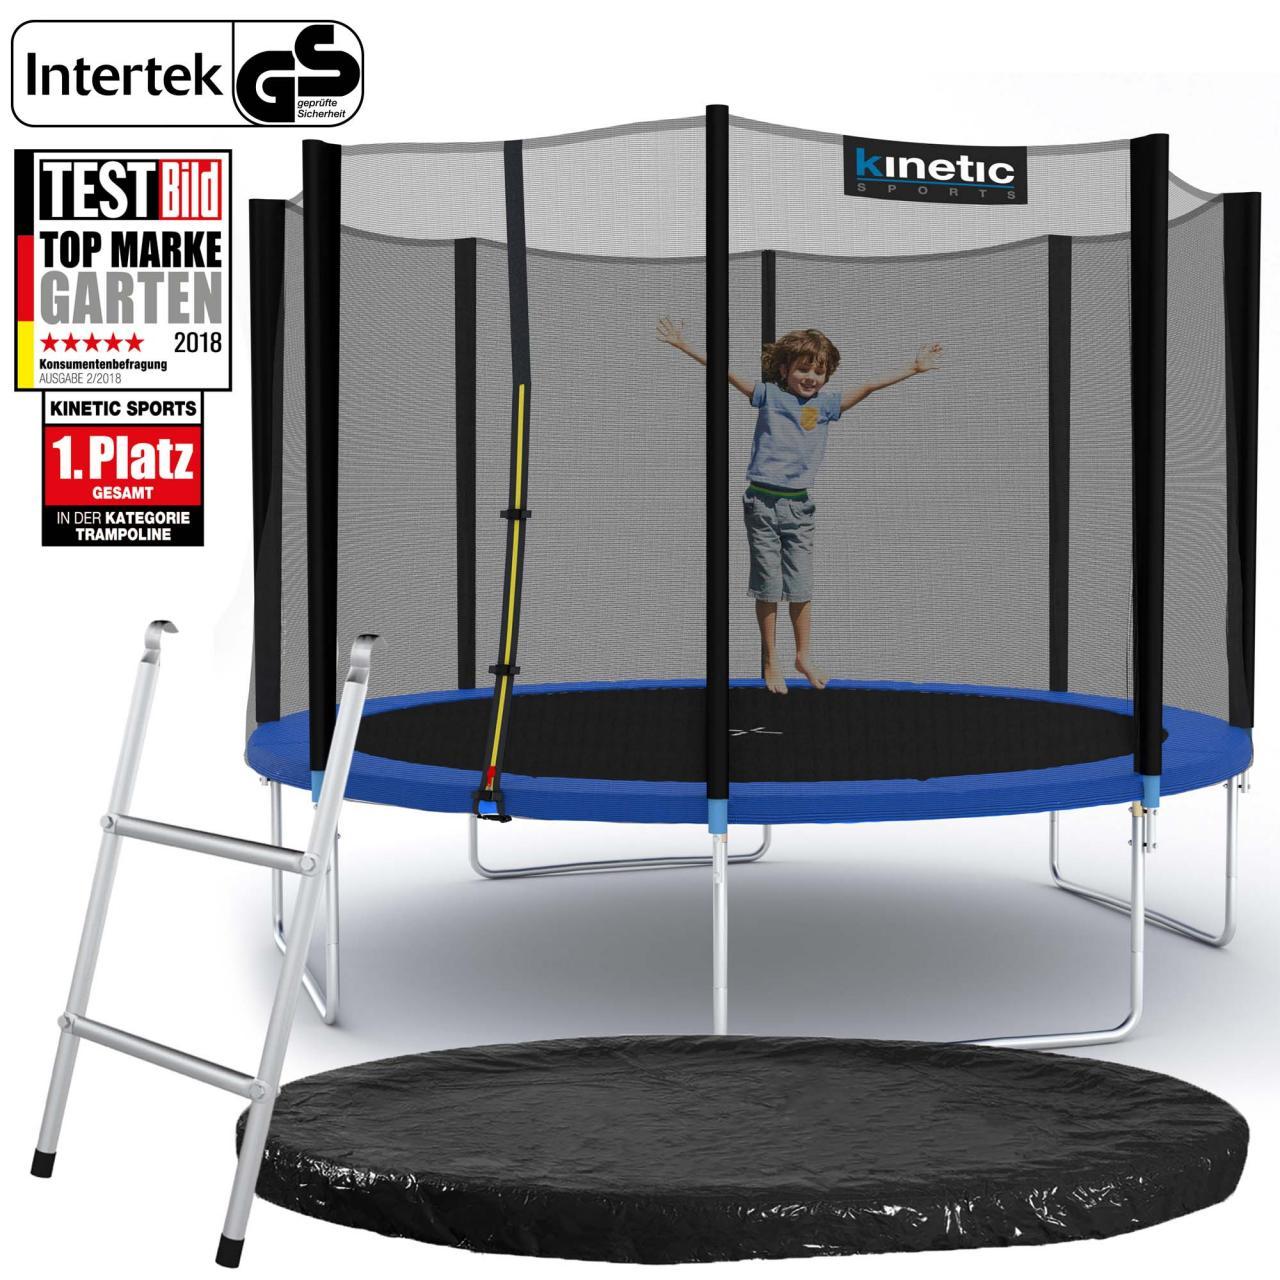 kinetic sports trampolin gartentrampolin mit zubeh r netz. Black Bedroom Furniture Sets. Home Design Ideas